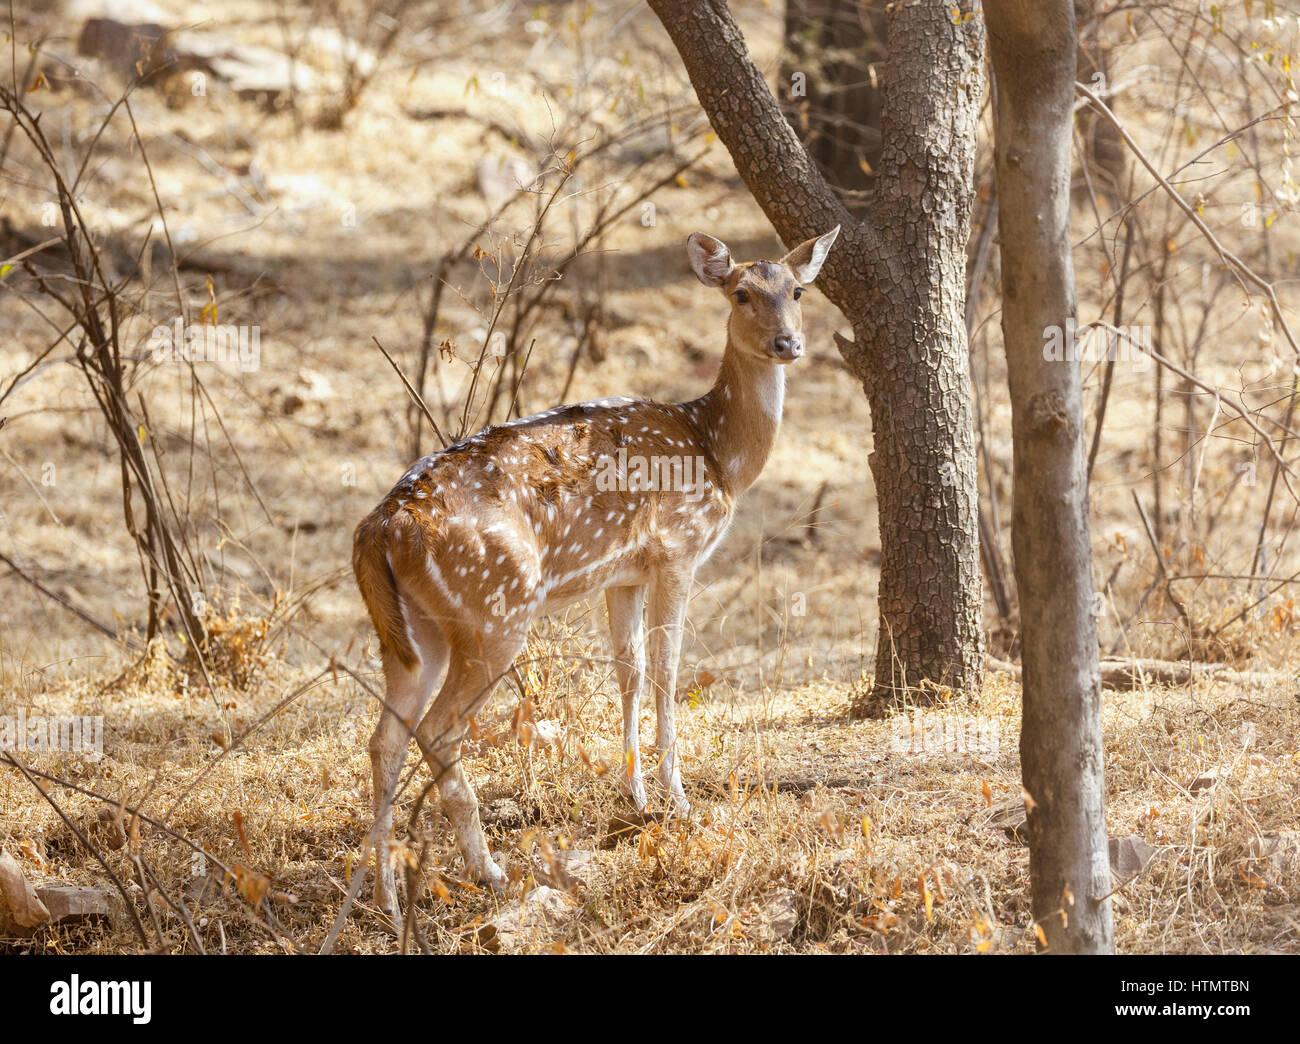 axis deer ranthambhore national park rajasthan india HTMTBN